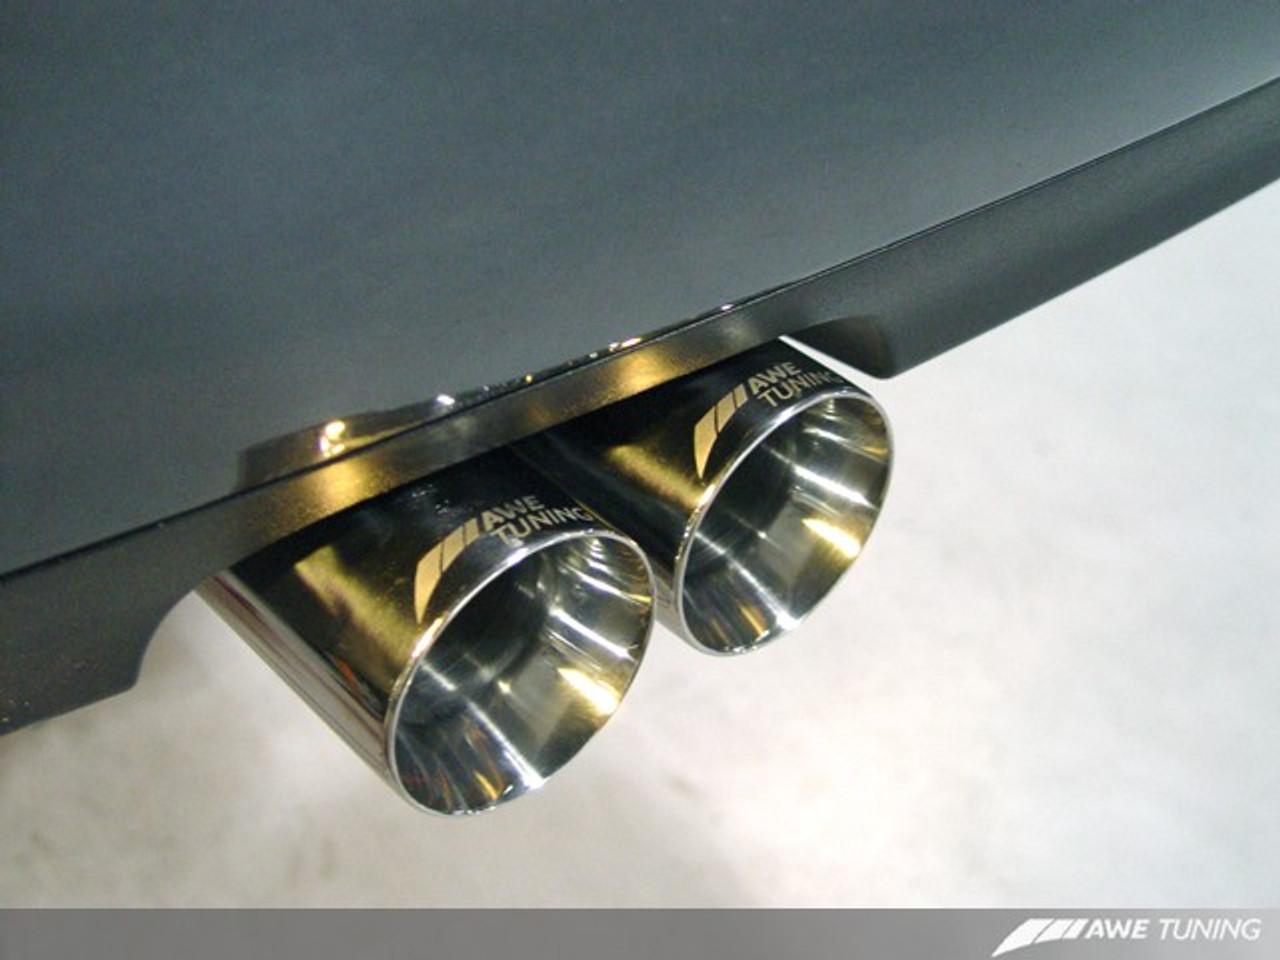 AWE Tuning Bora 1.8T Performance Exhaust